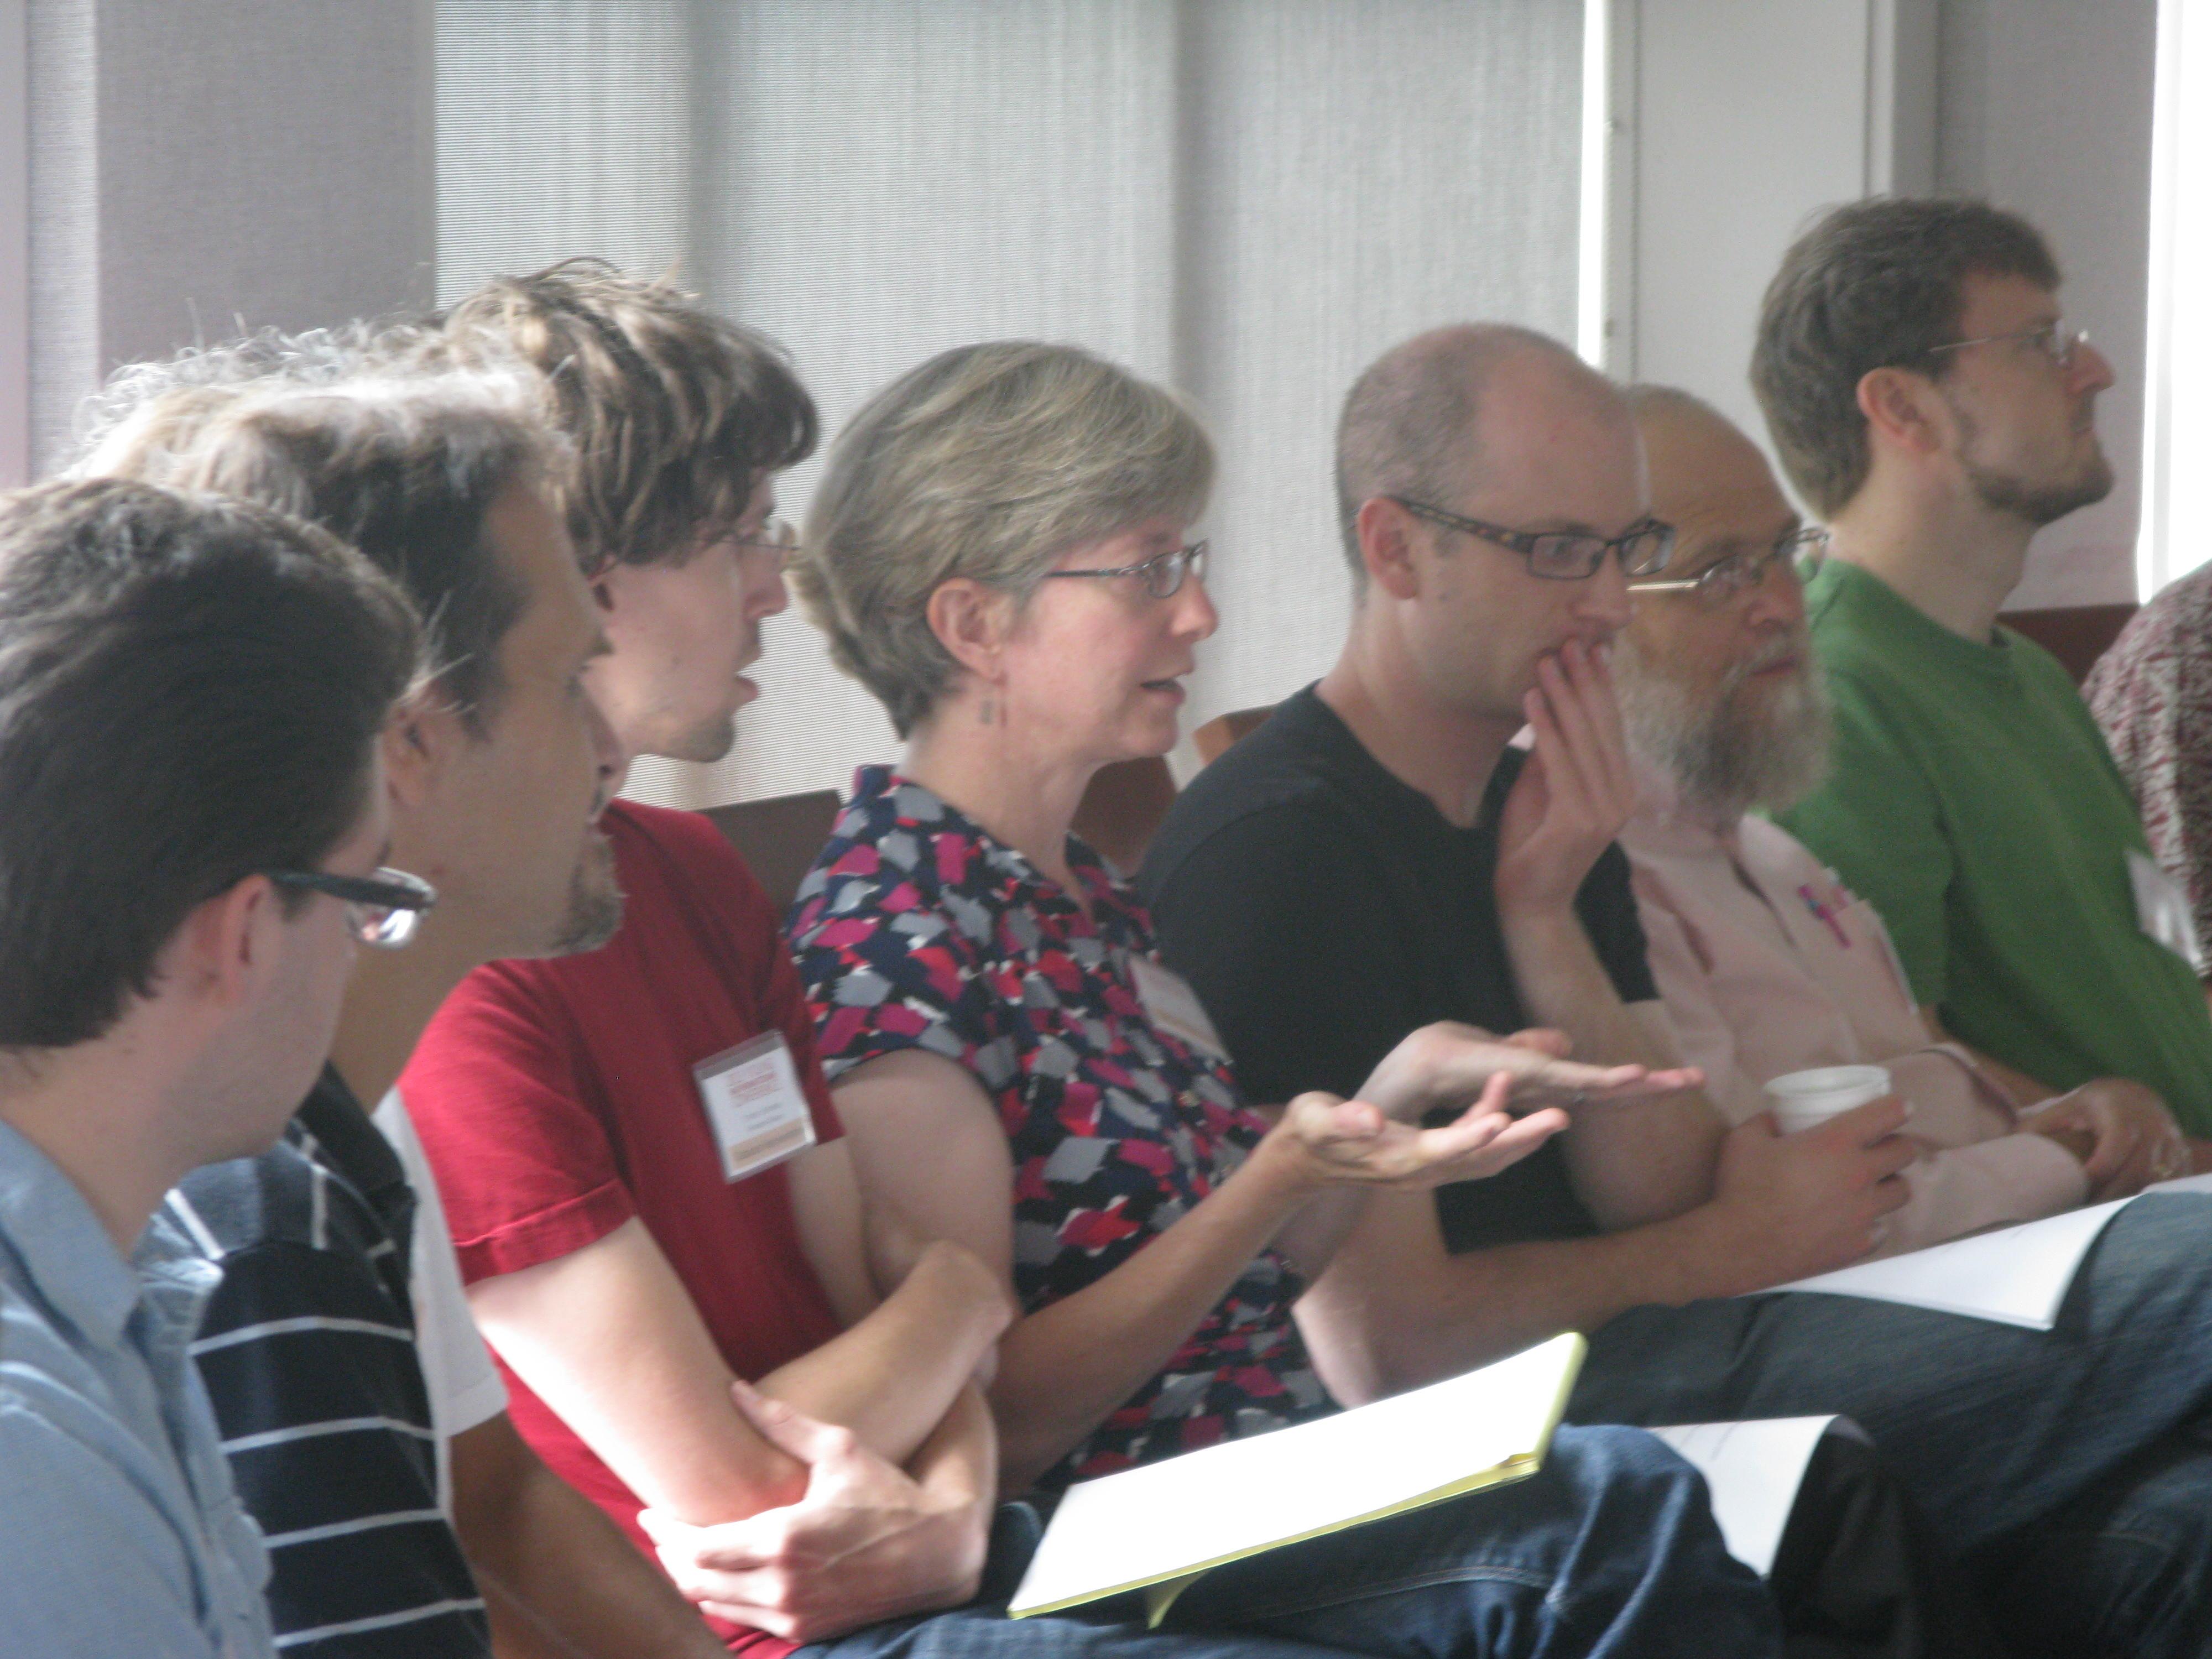 The graduate school panel discussion.